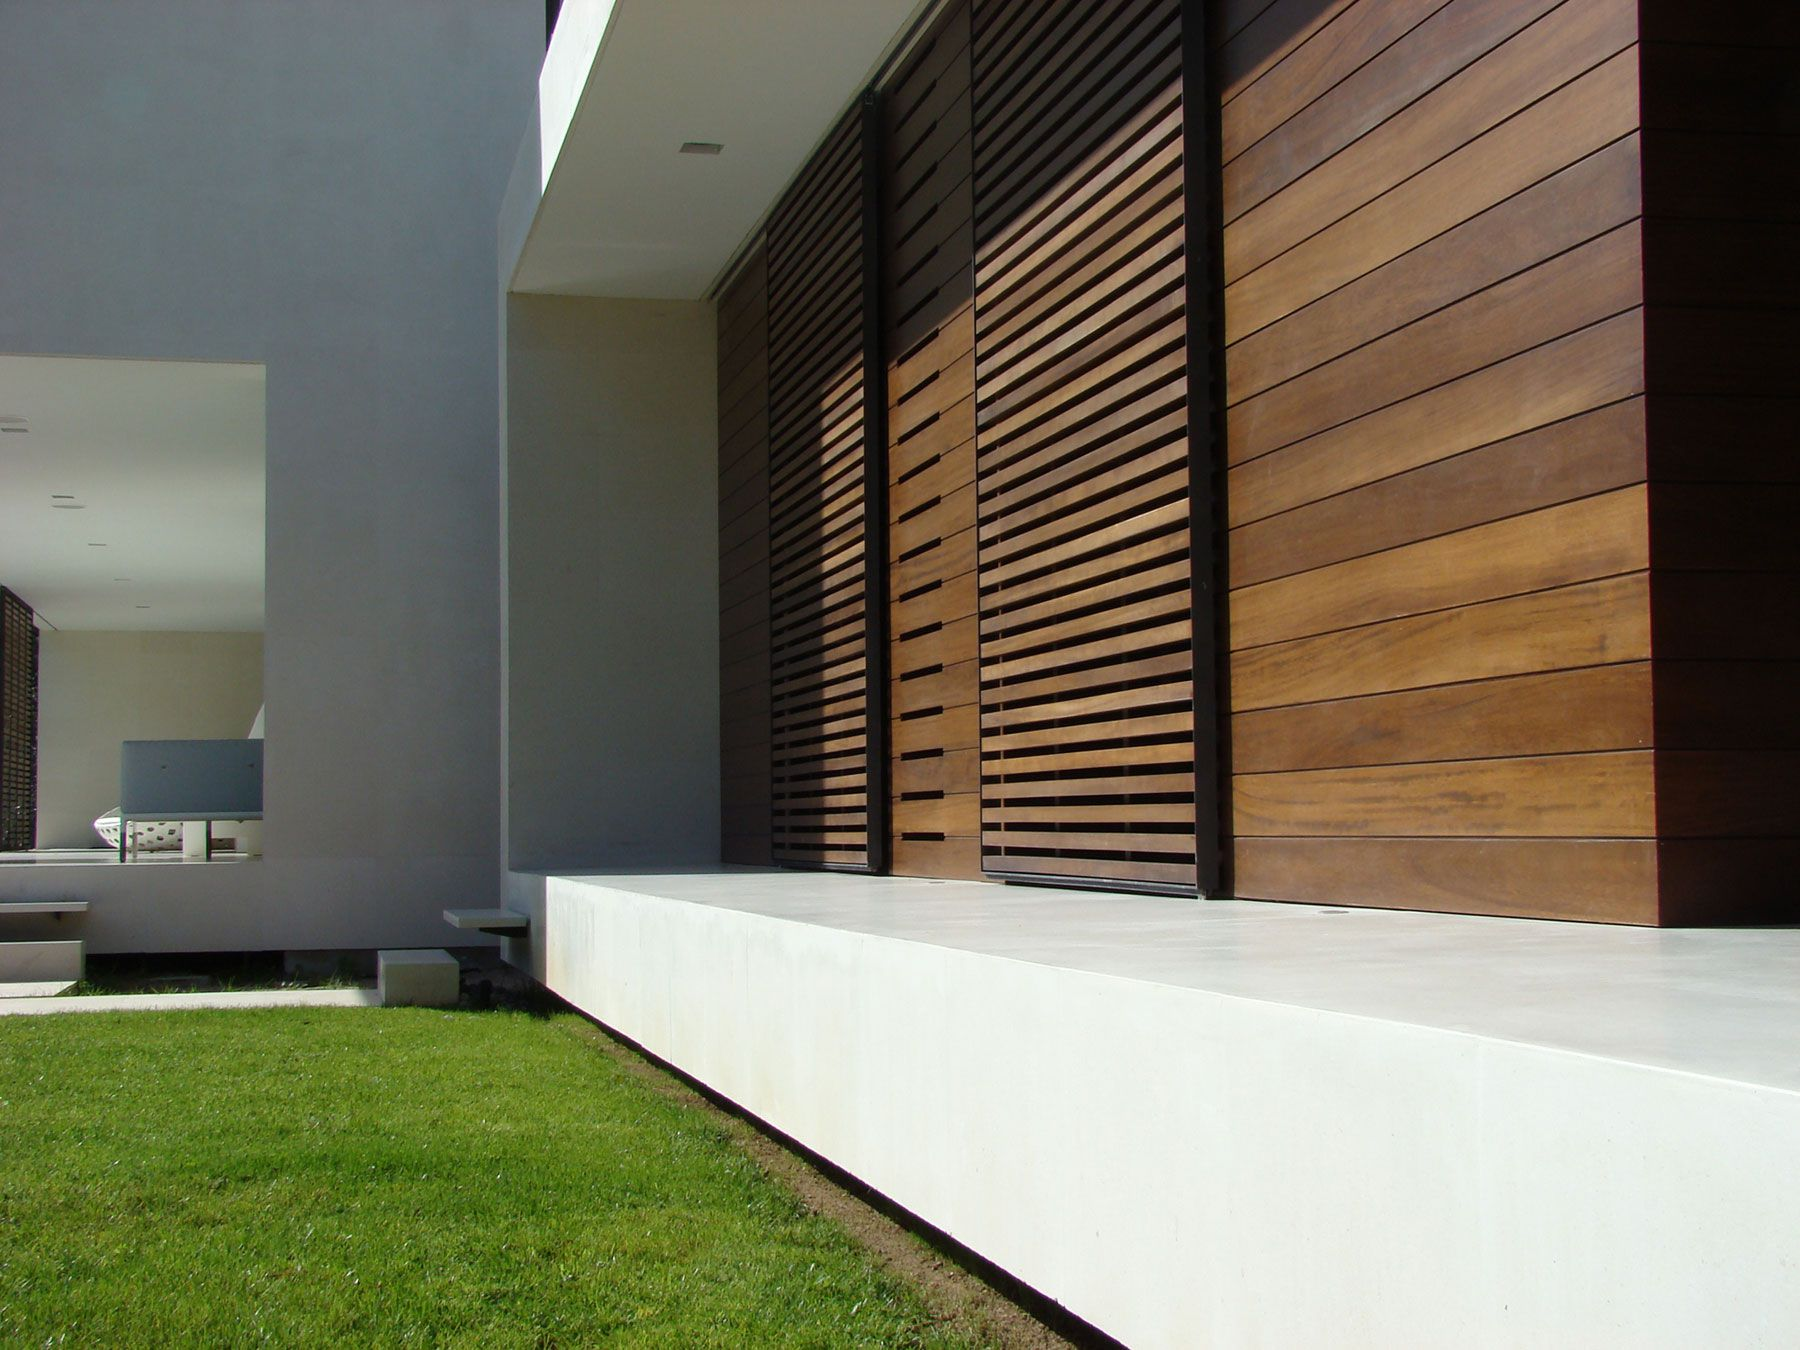 Casa-Bauzà-04-1